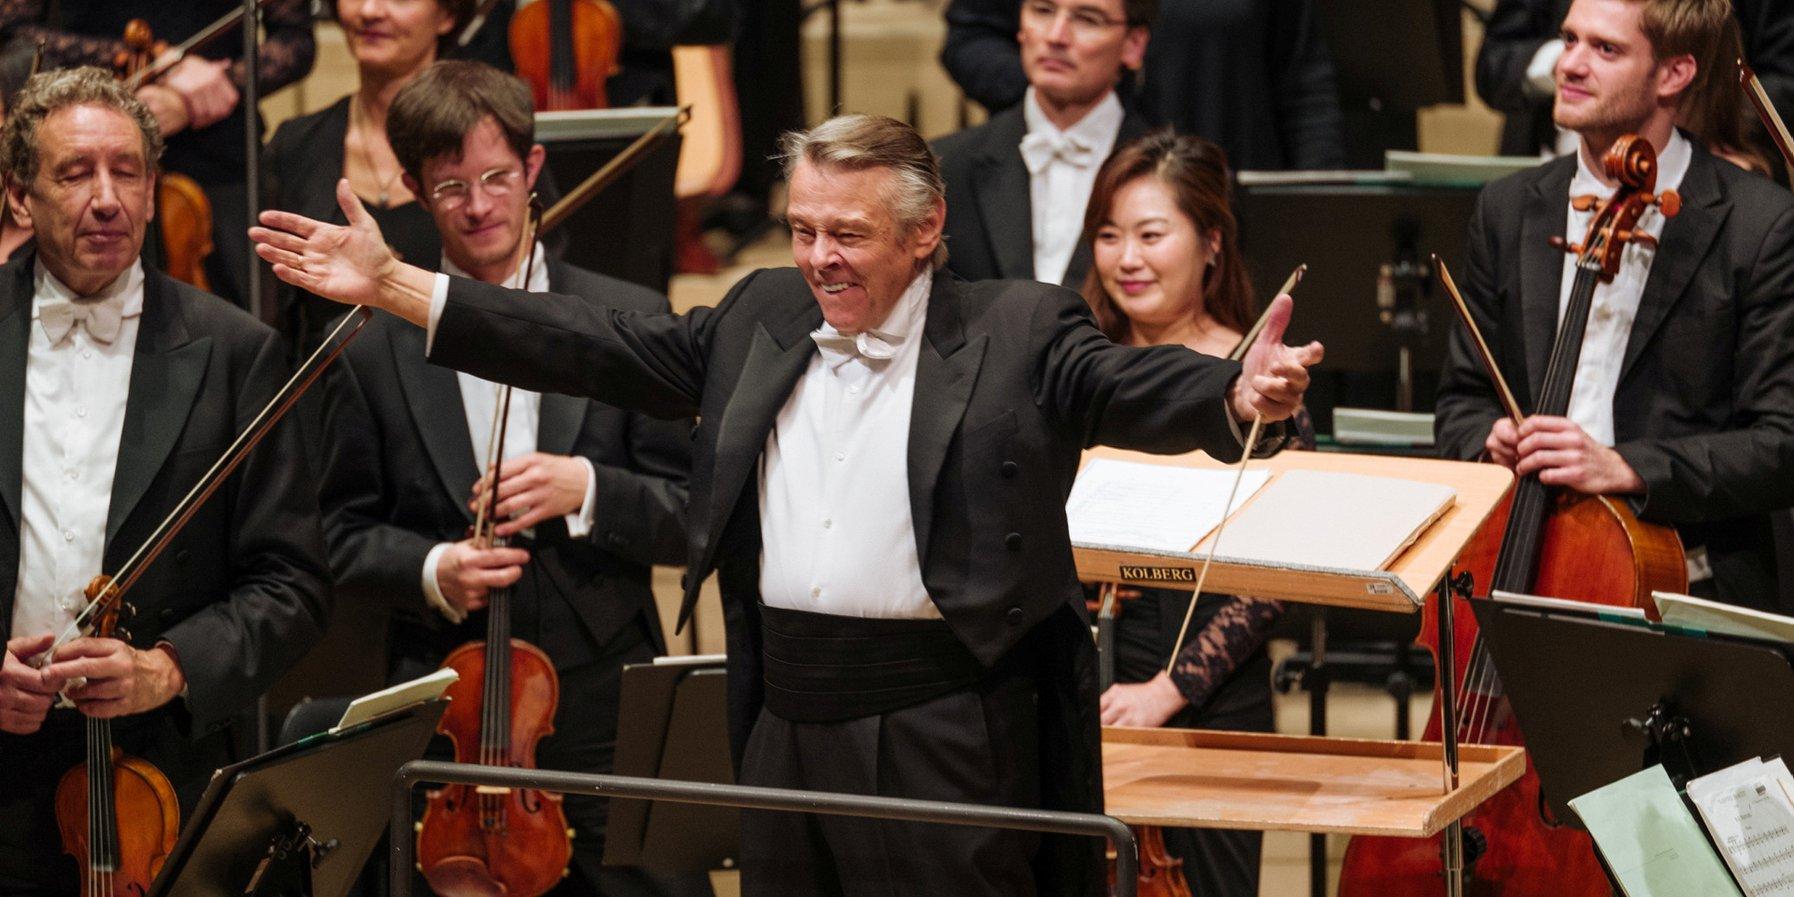 Mariss Jansons at the Elbphilharmonie on 13 January 2018